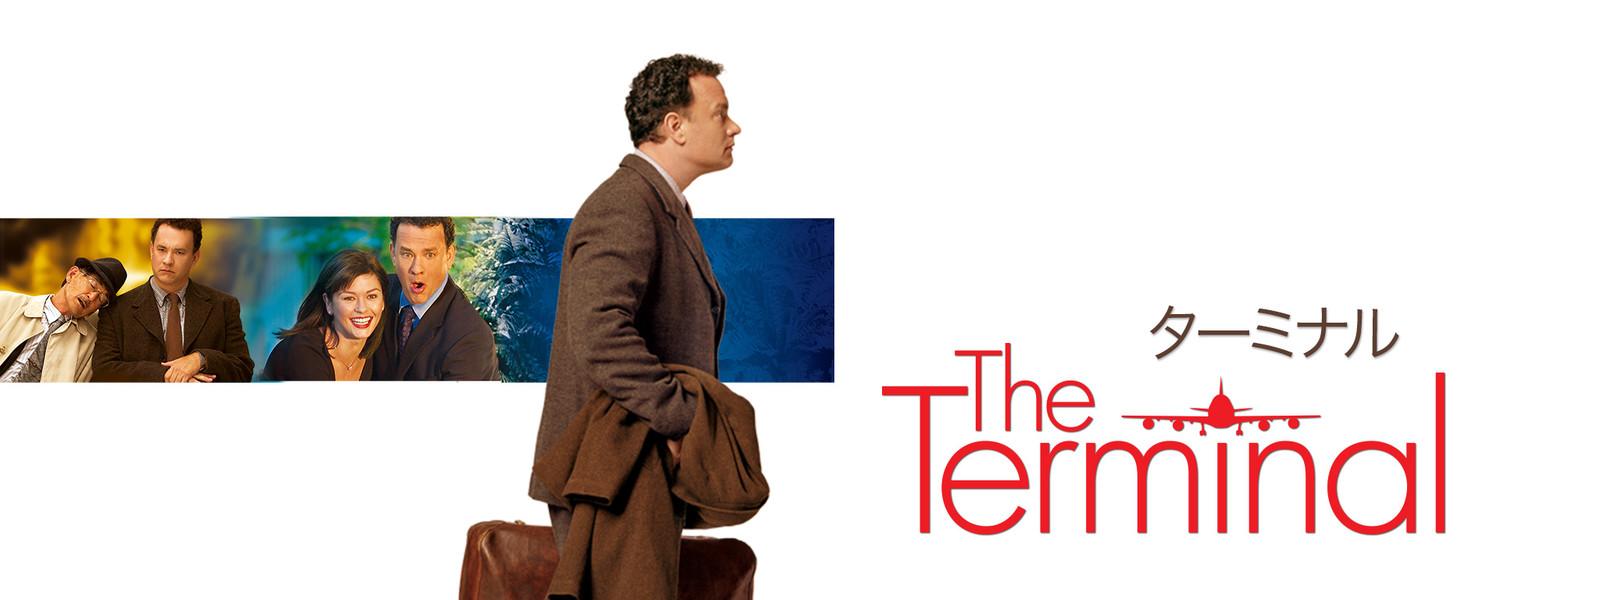 The Terminal